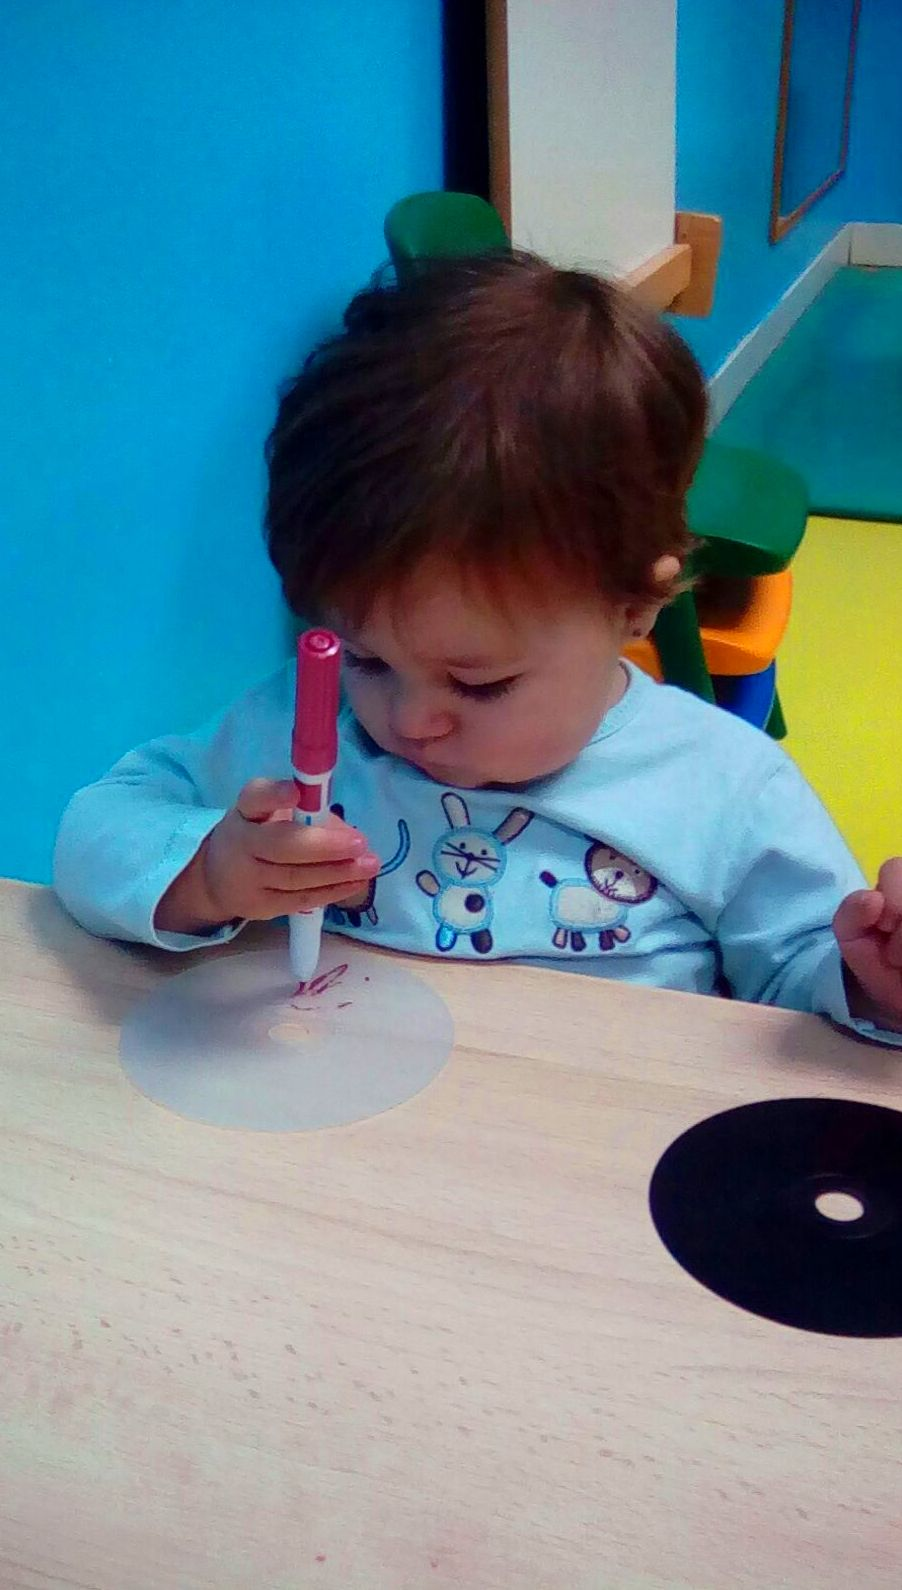 Foto 29 de Escuela infantil en Algete | E.I. Cuatro Pecas de Colores